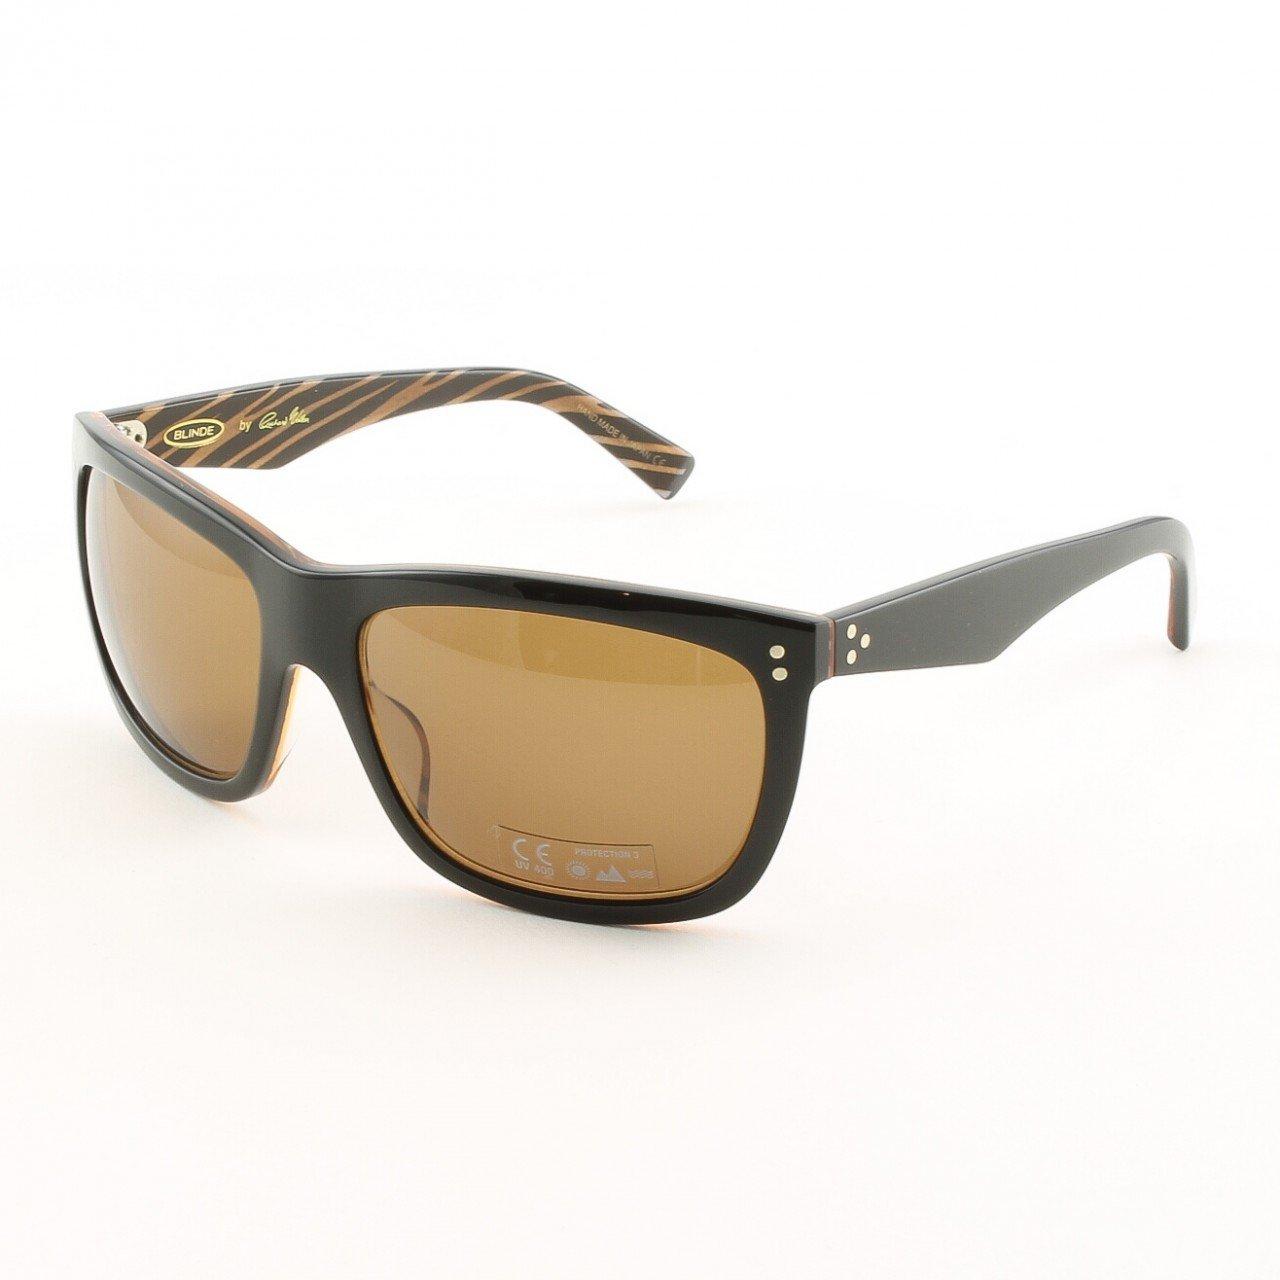 Blinde I'll Make It Up 2 U Unisex Sunglasses Col. Brown Zebra with Brown Lenses